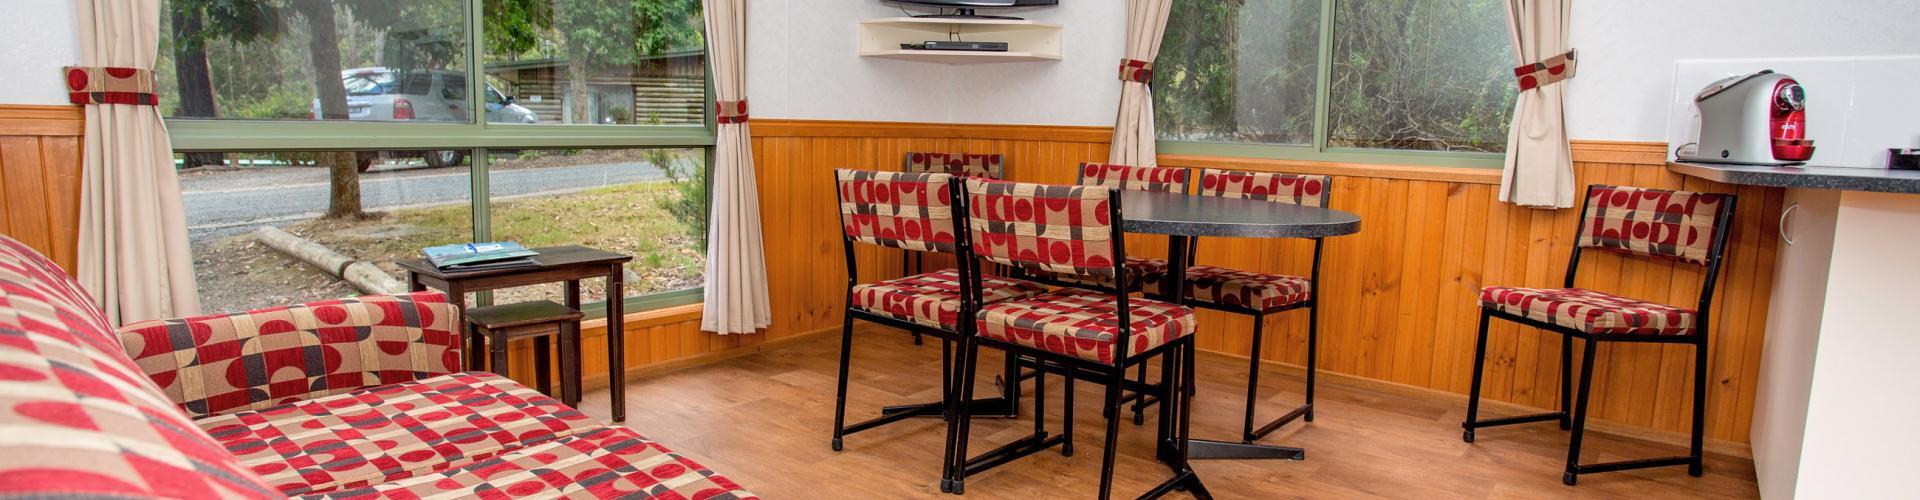 BIG4 Yarra Valley Park Lane Holiday Park - 3 Bedroom Family Cabin - Living